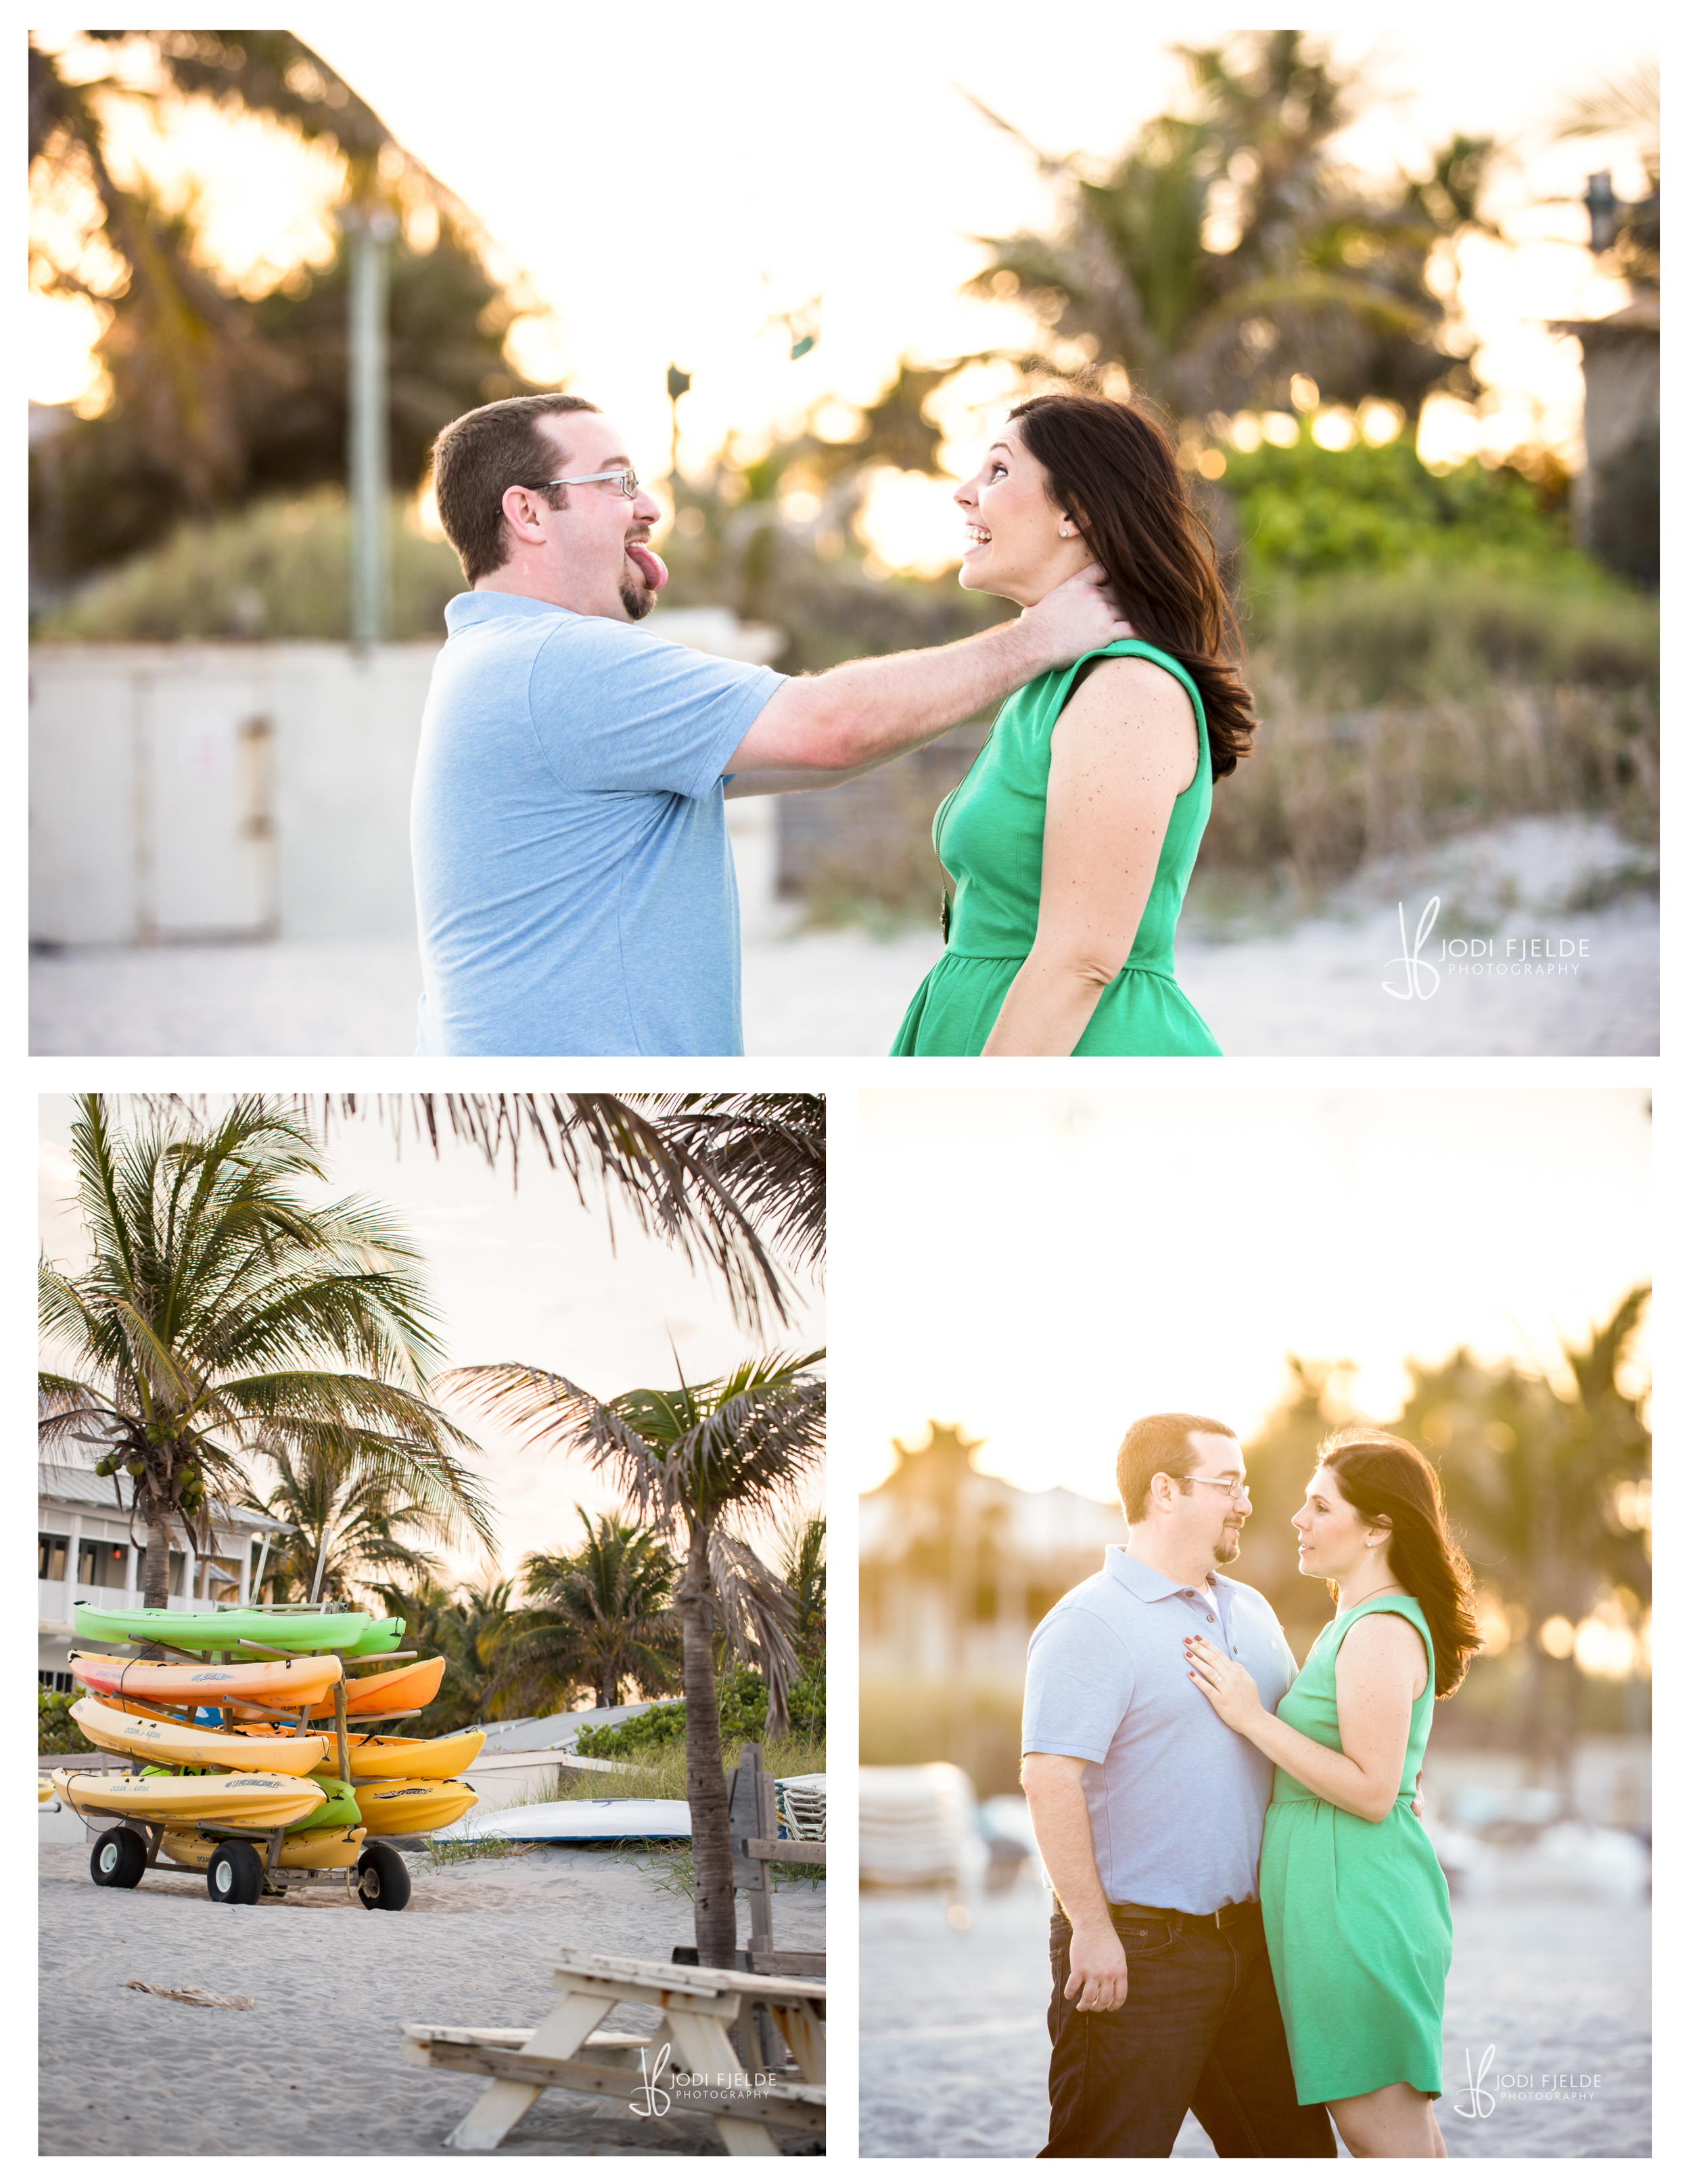 Delray_BEach_Sundy_HouseFlorida_engagement_E-session_Allison_&_Matt_photography_jodi_Fjelde_photography_10.jpg